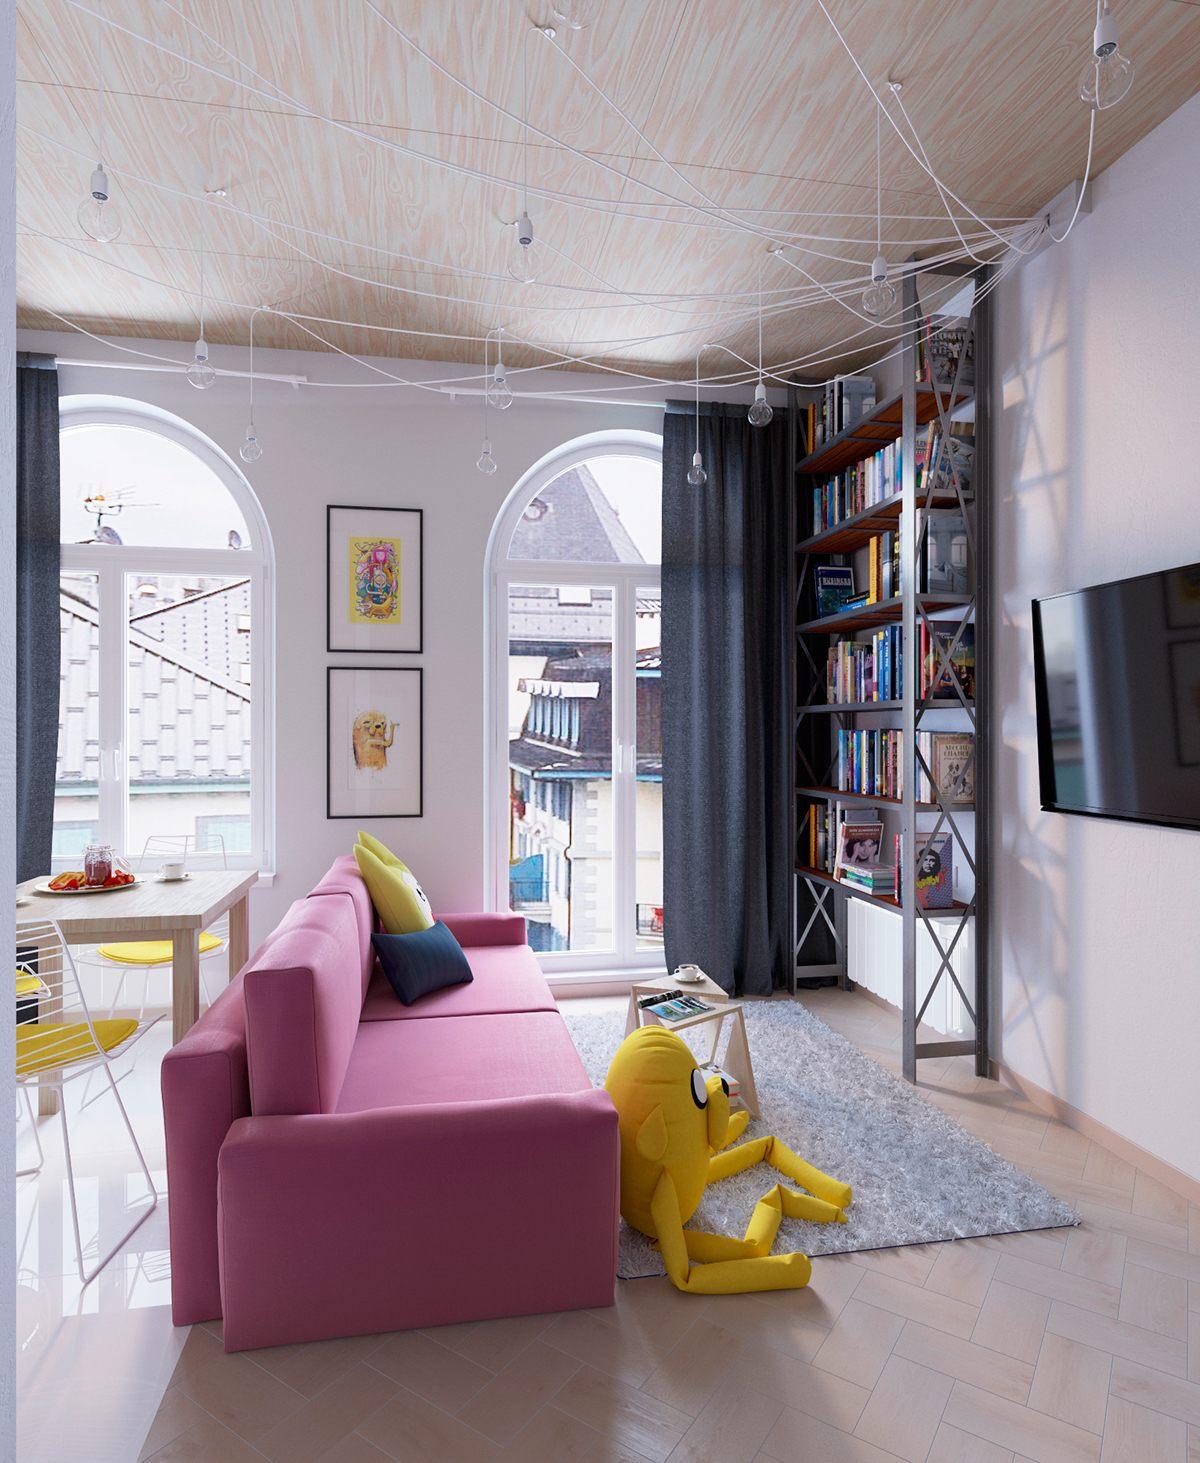 adventure-time-home-decor